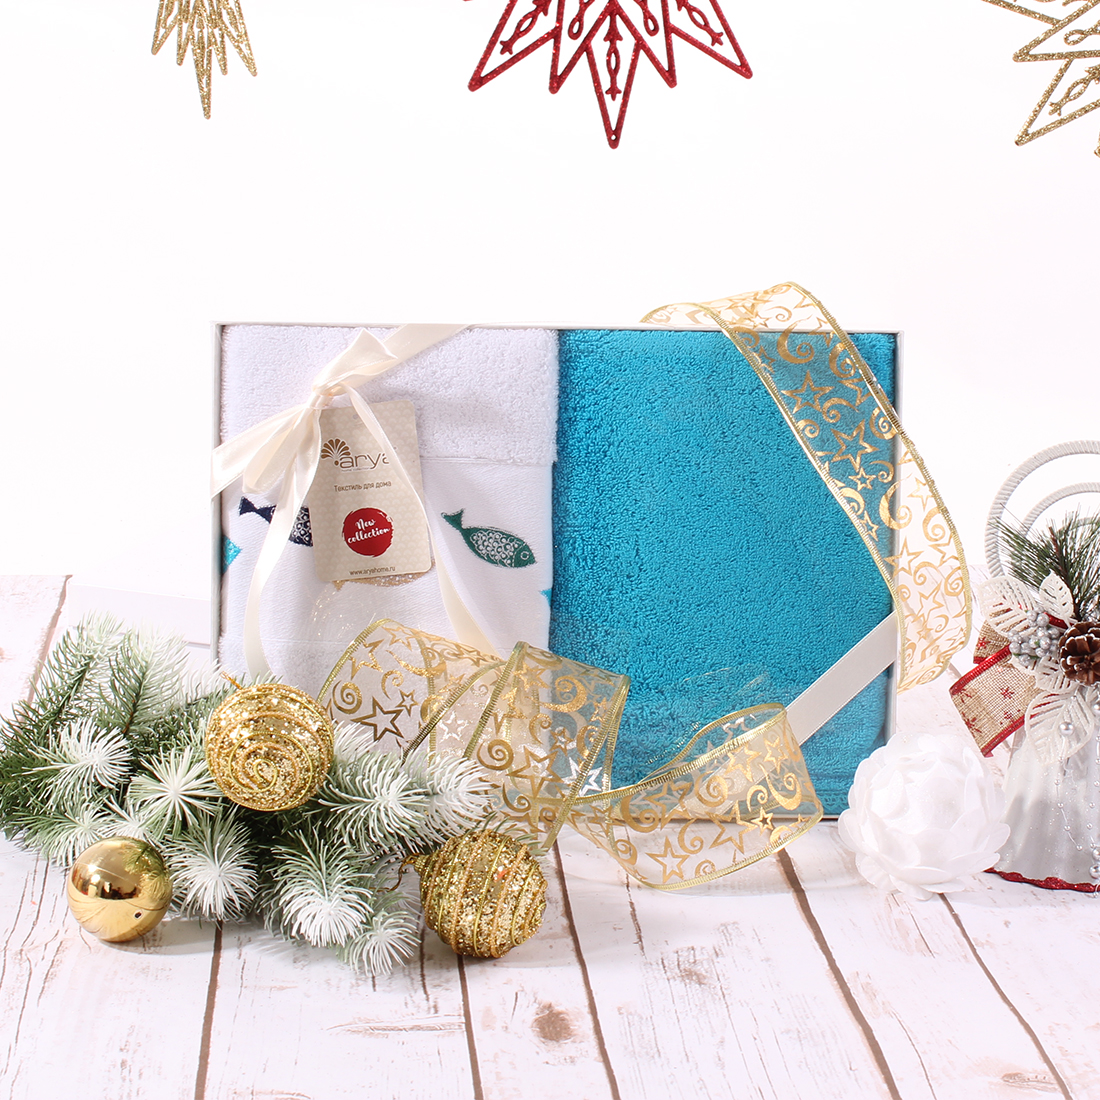 Полотенца Arya Полотенце Melis Цвет: Экрю, Голубой (50х90 см - 2 шт)